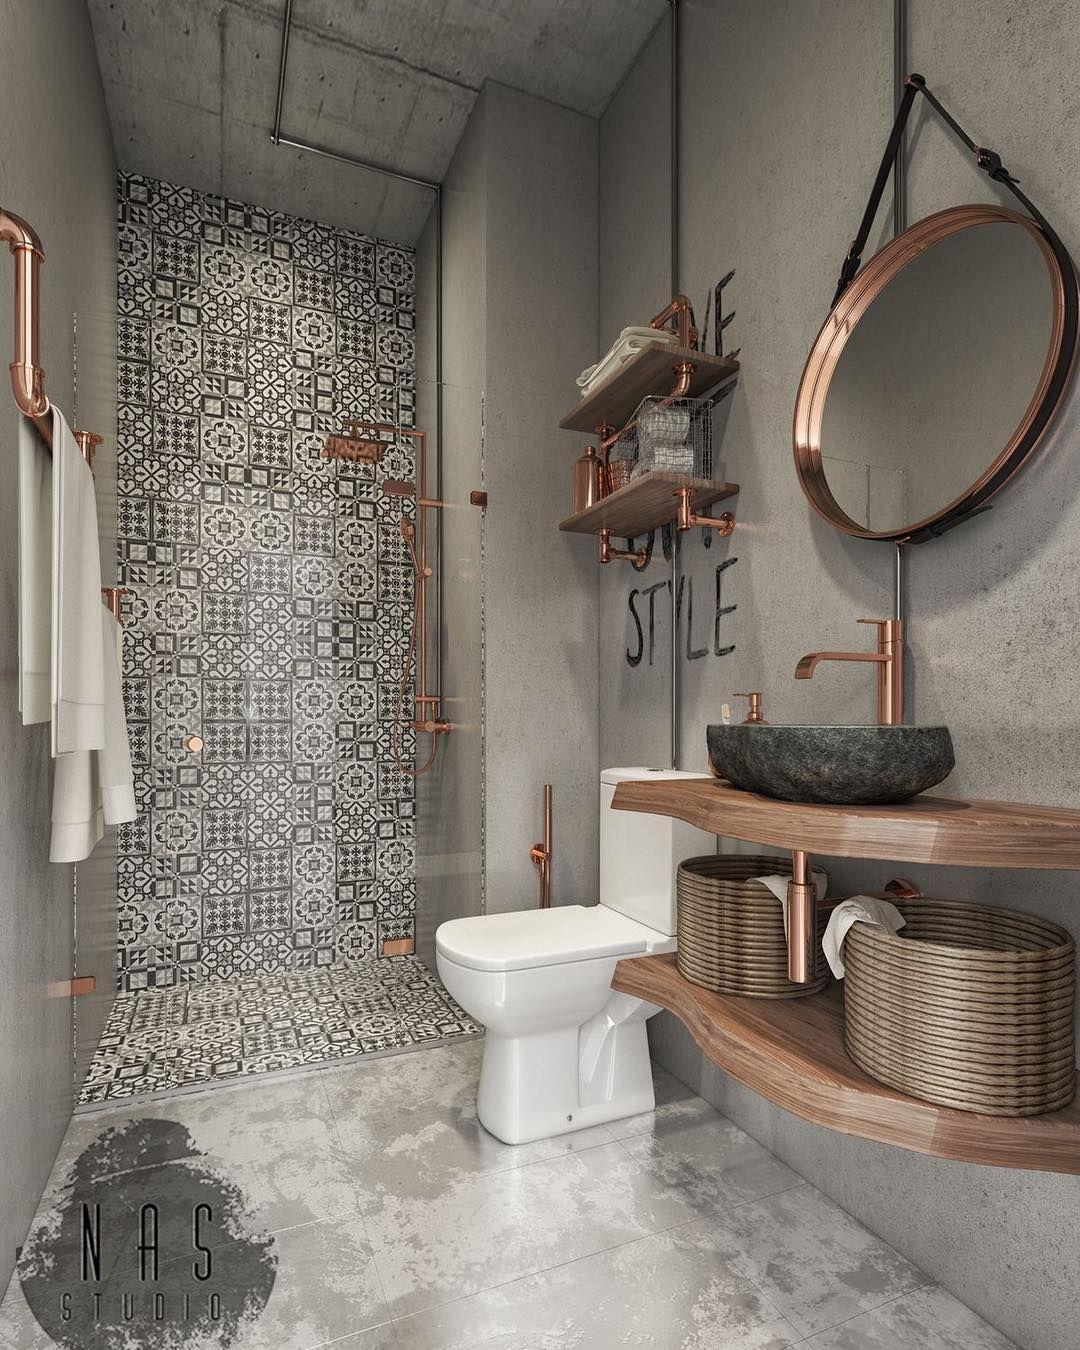 12 Industrial Modern Bathroom Awesome And Also Attractive Diyhous Bathroom Decor Bathroom Inspiration House Bathroom